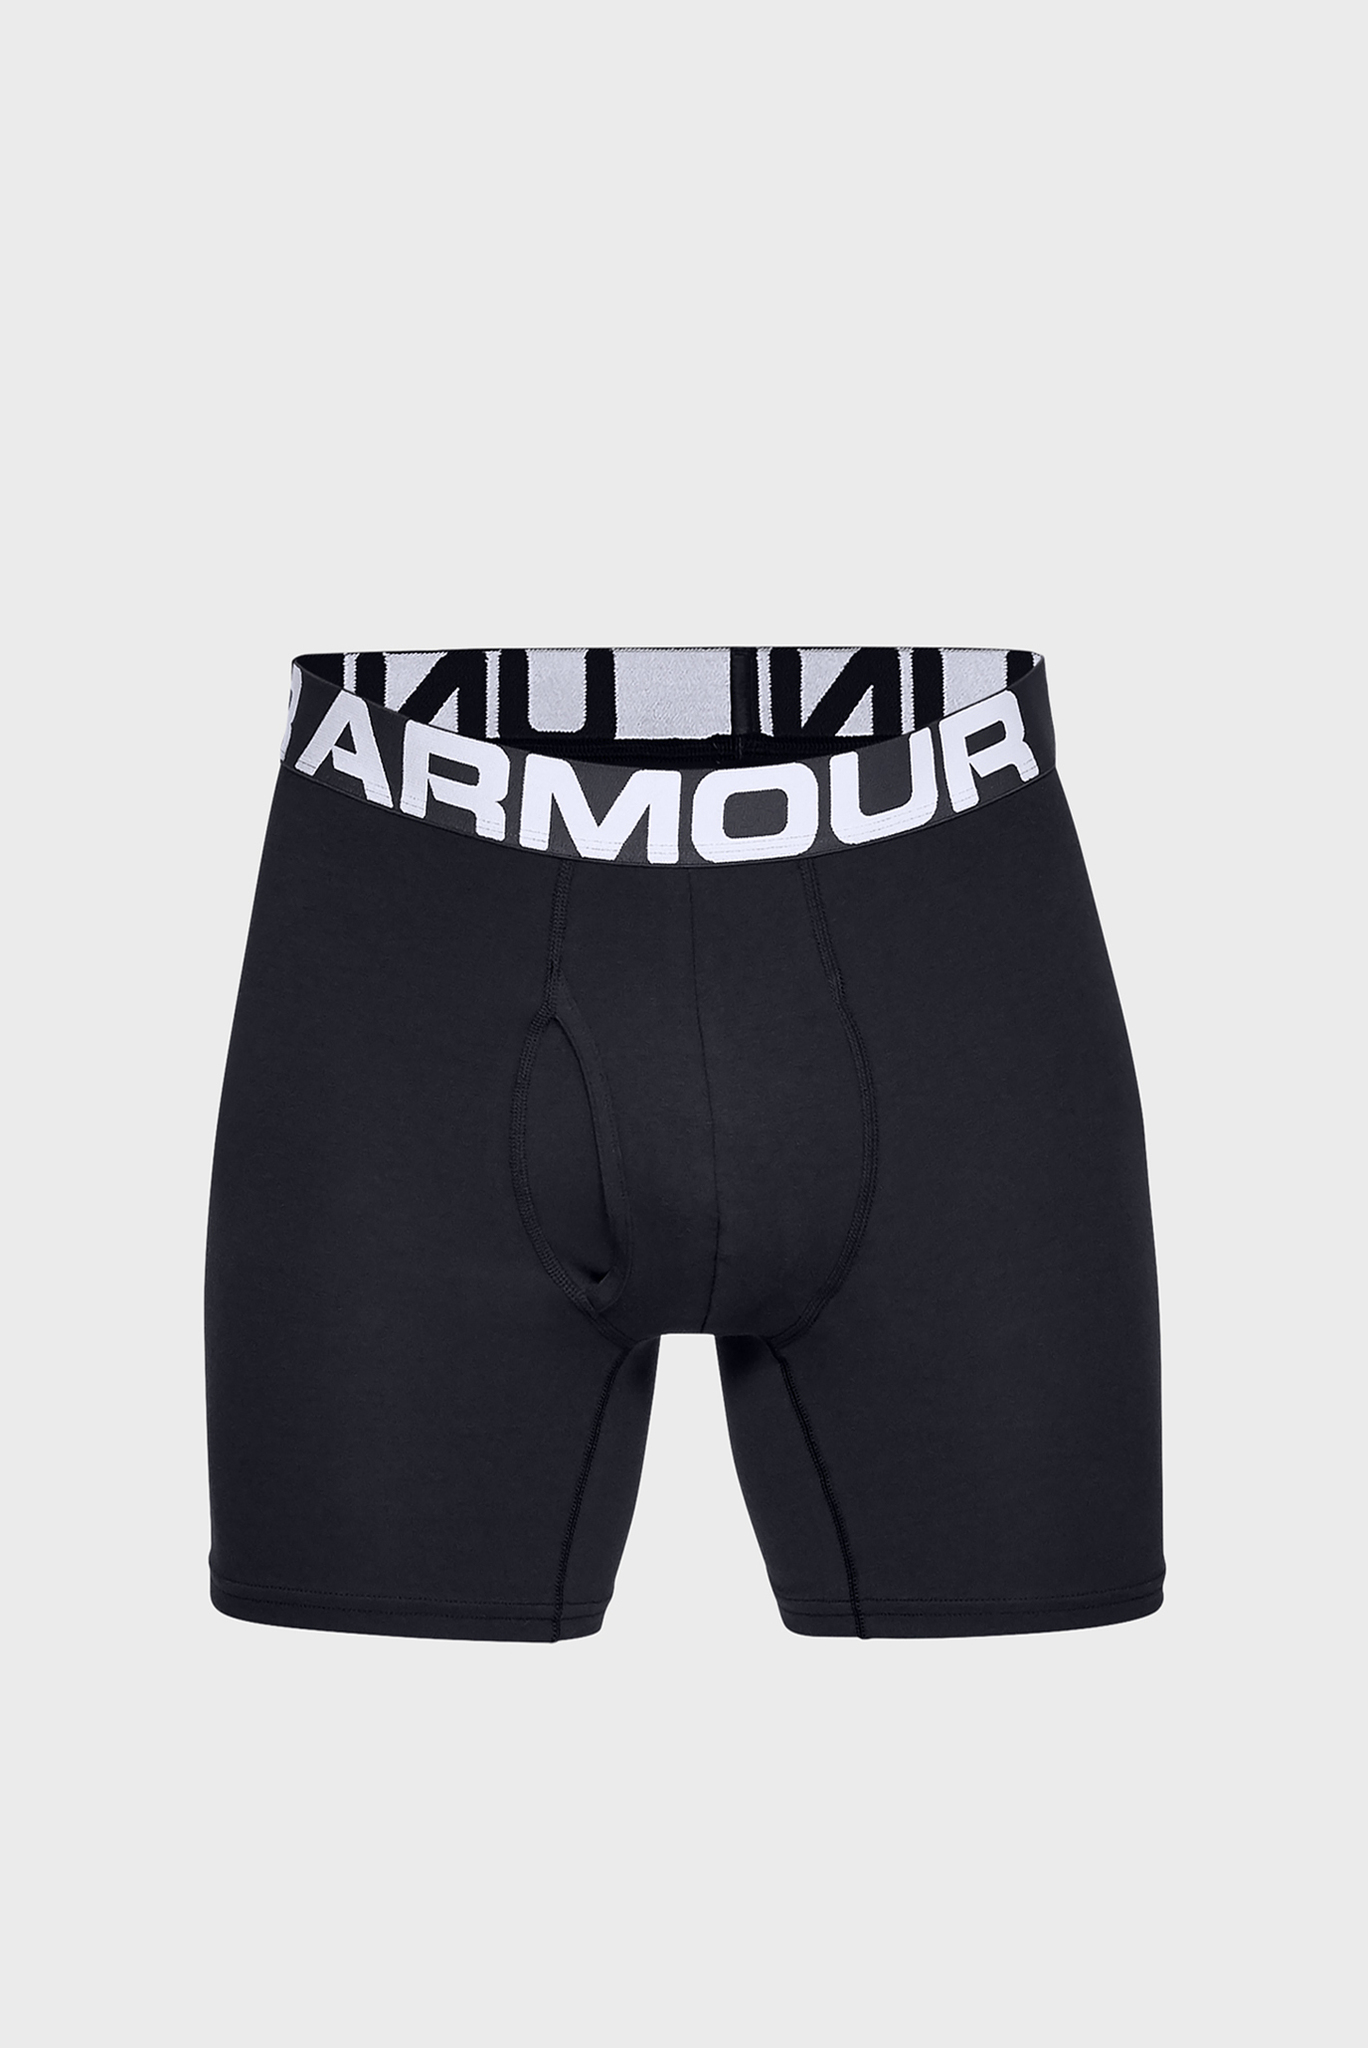 Мужские черные трусы-боксеры (3 шт) Charged Cotton 6in 3 Pack Under Armour